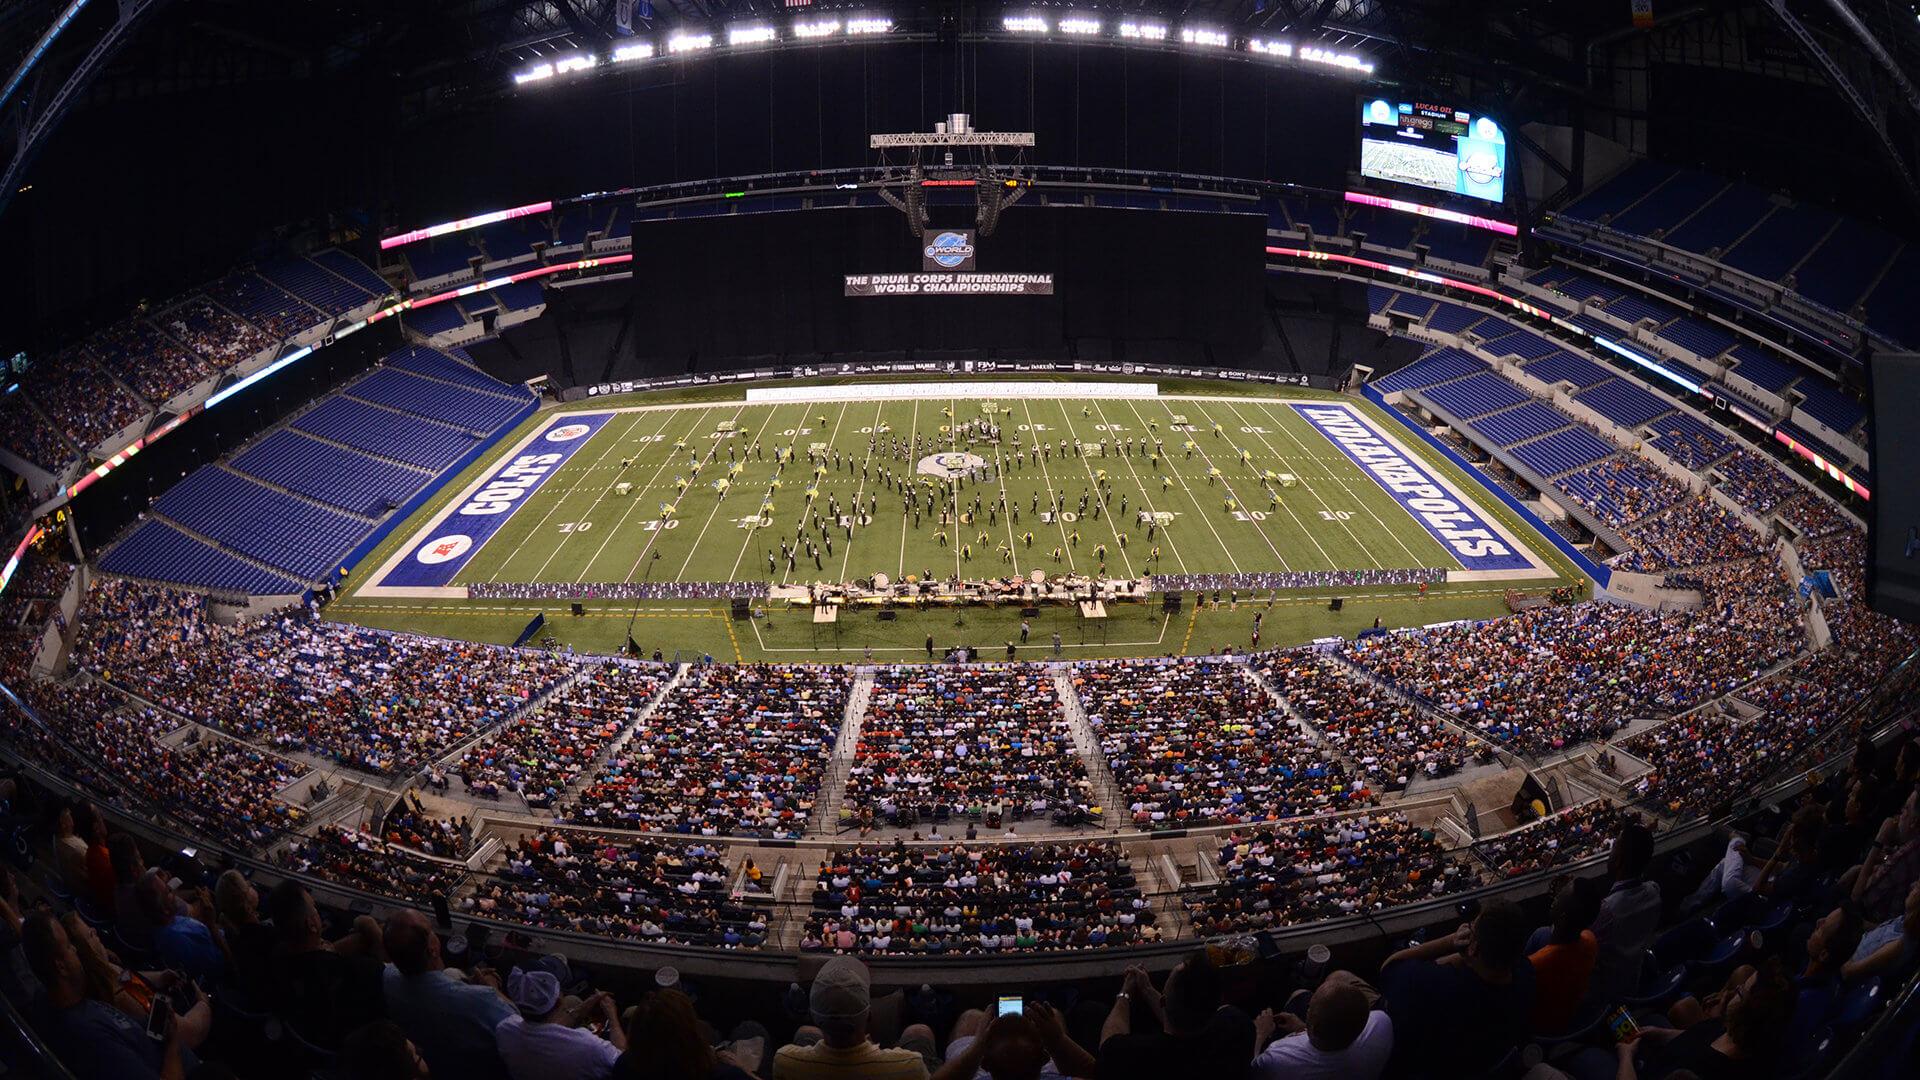 Attendance records set across 2015 Drum Corps International Tour